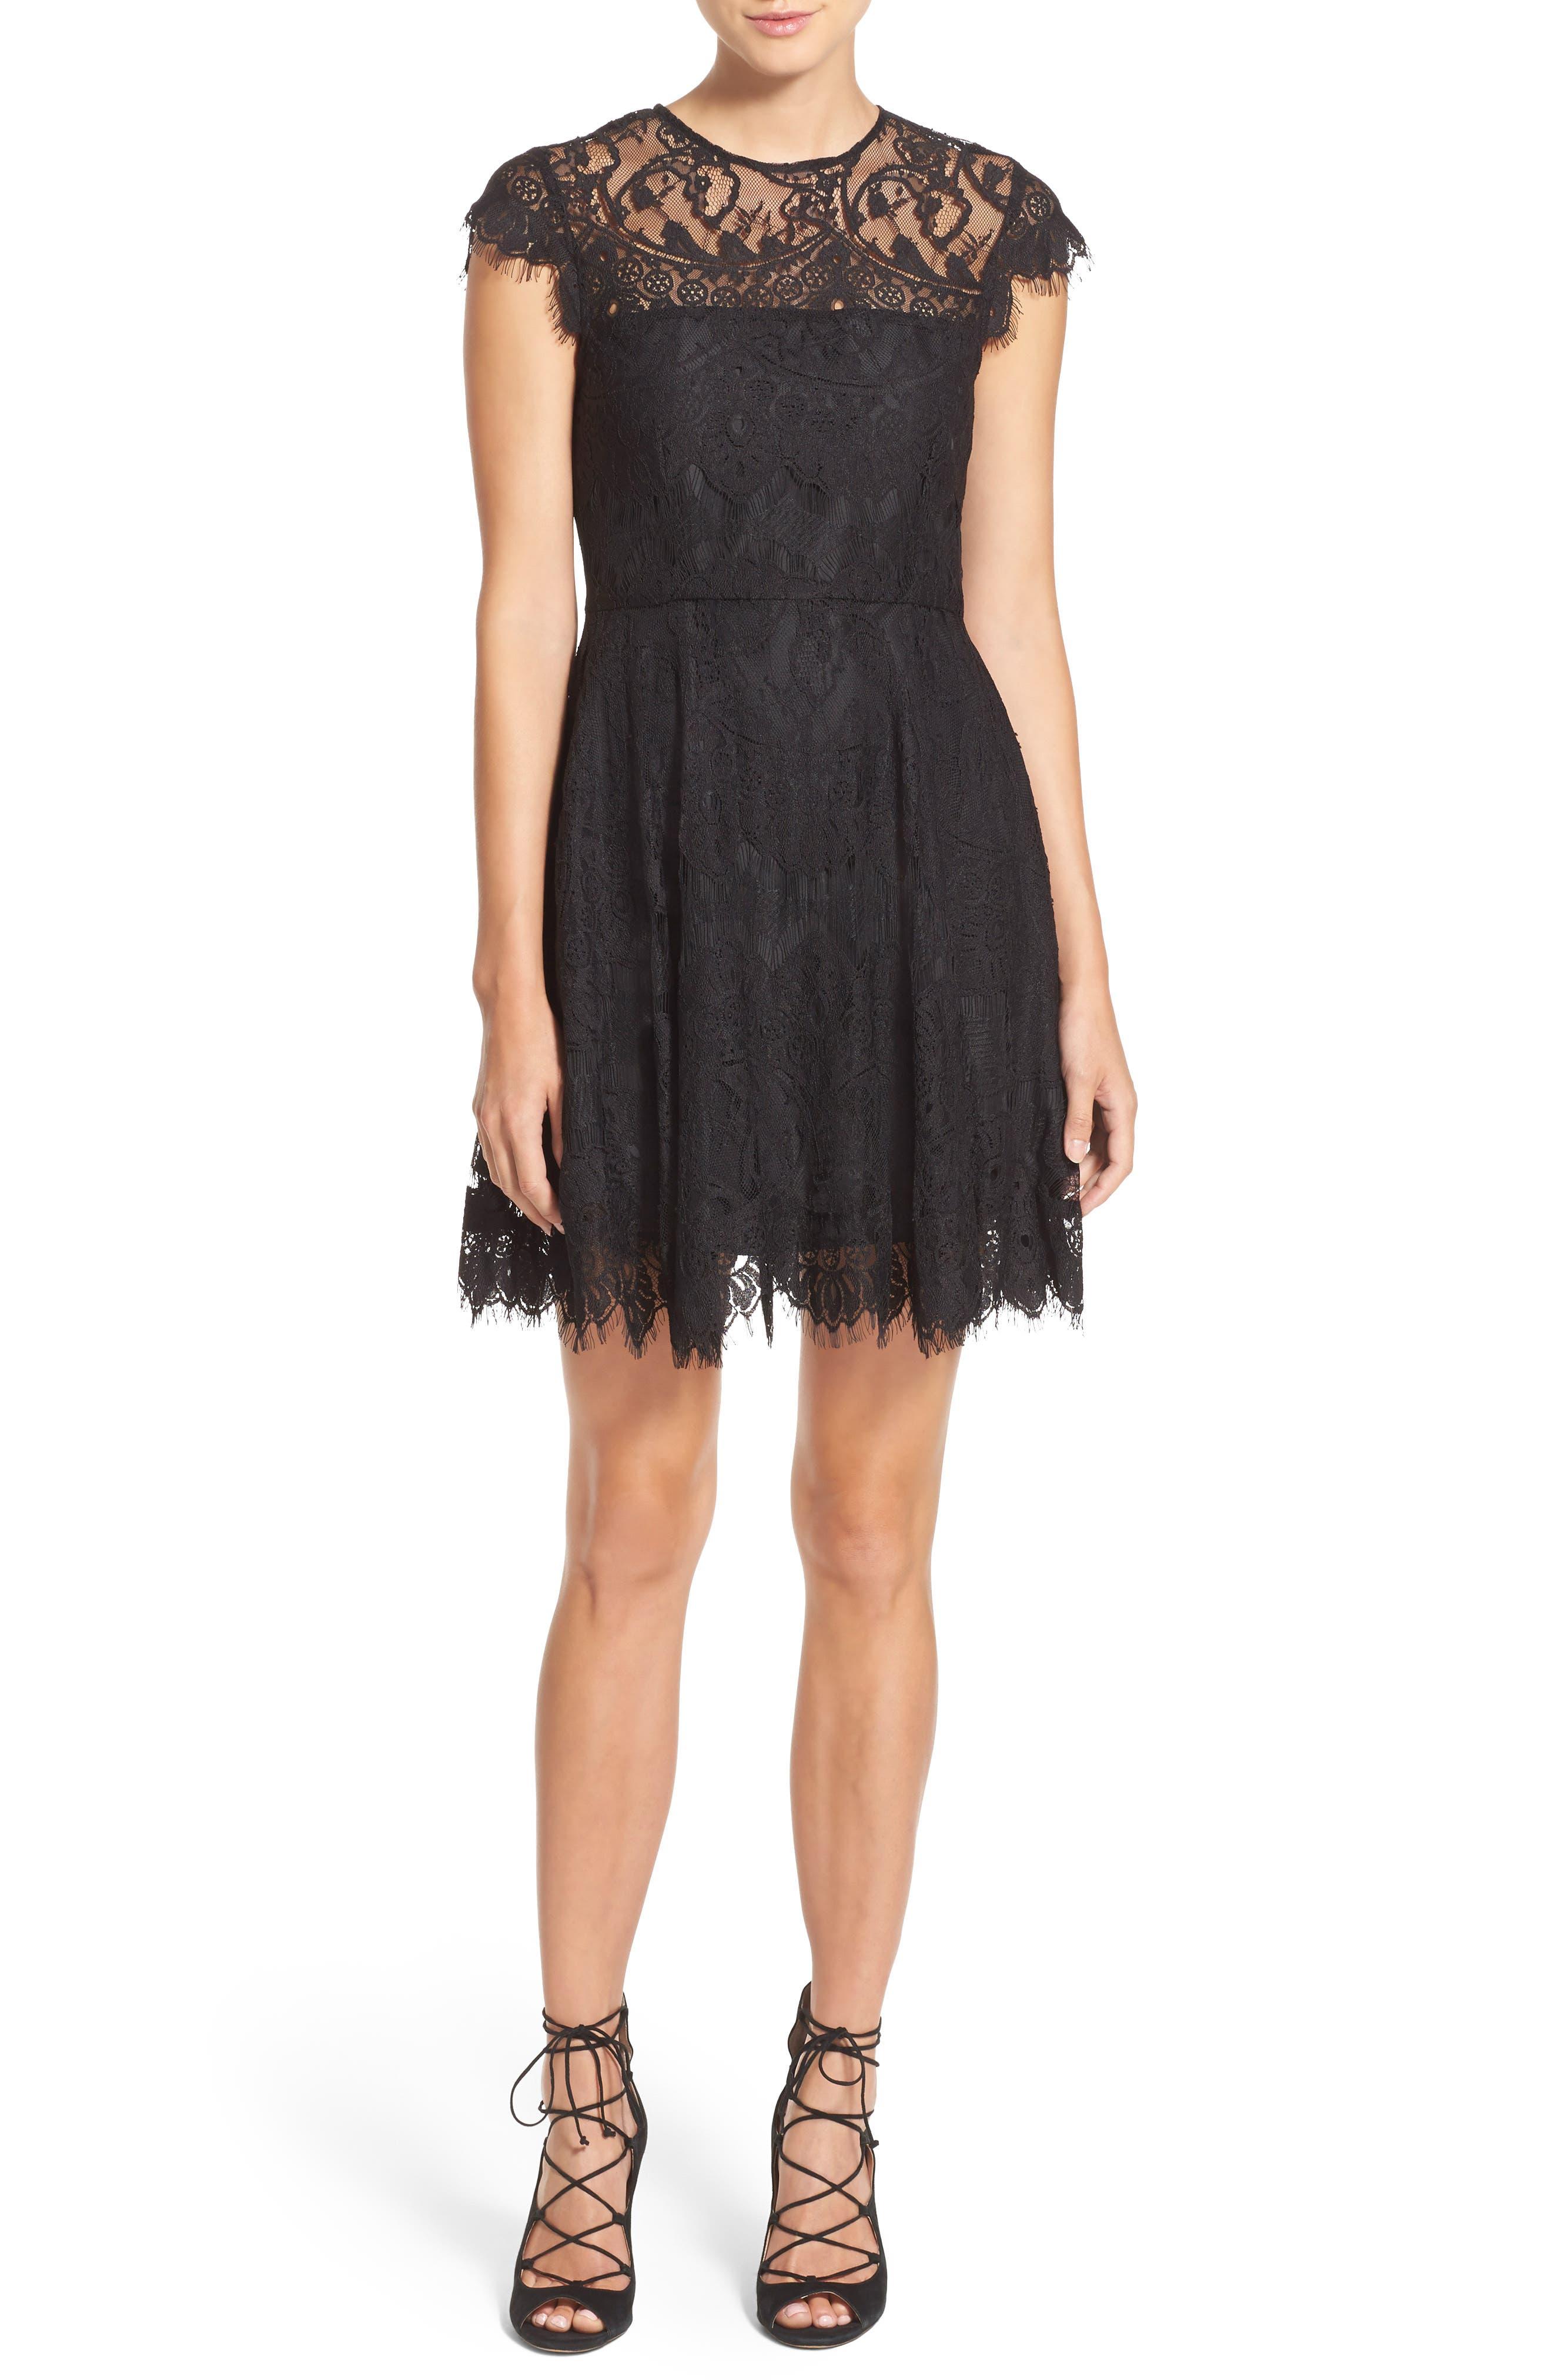 Bb Dakota Rhianna Open Back Lace Fit & Flare Cocktail Dress, Black